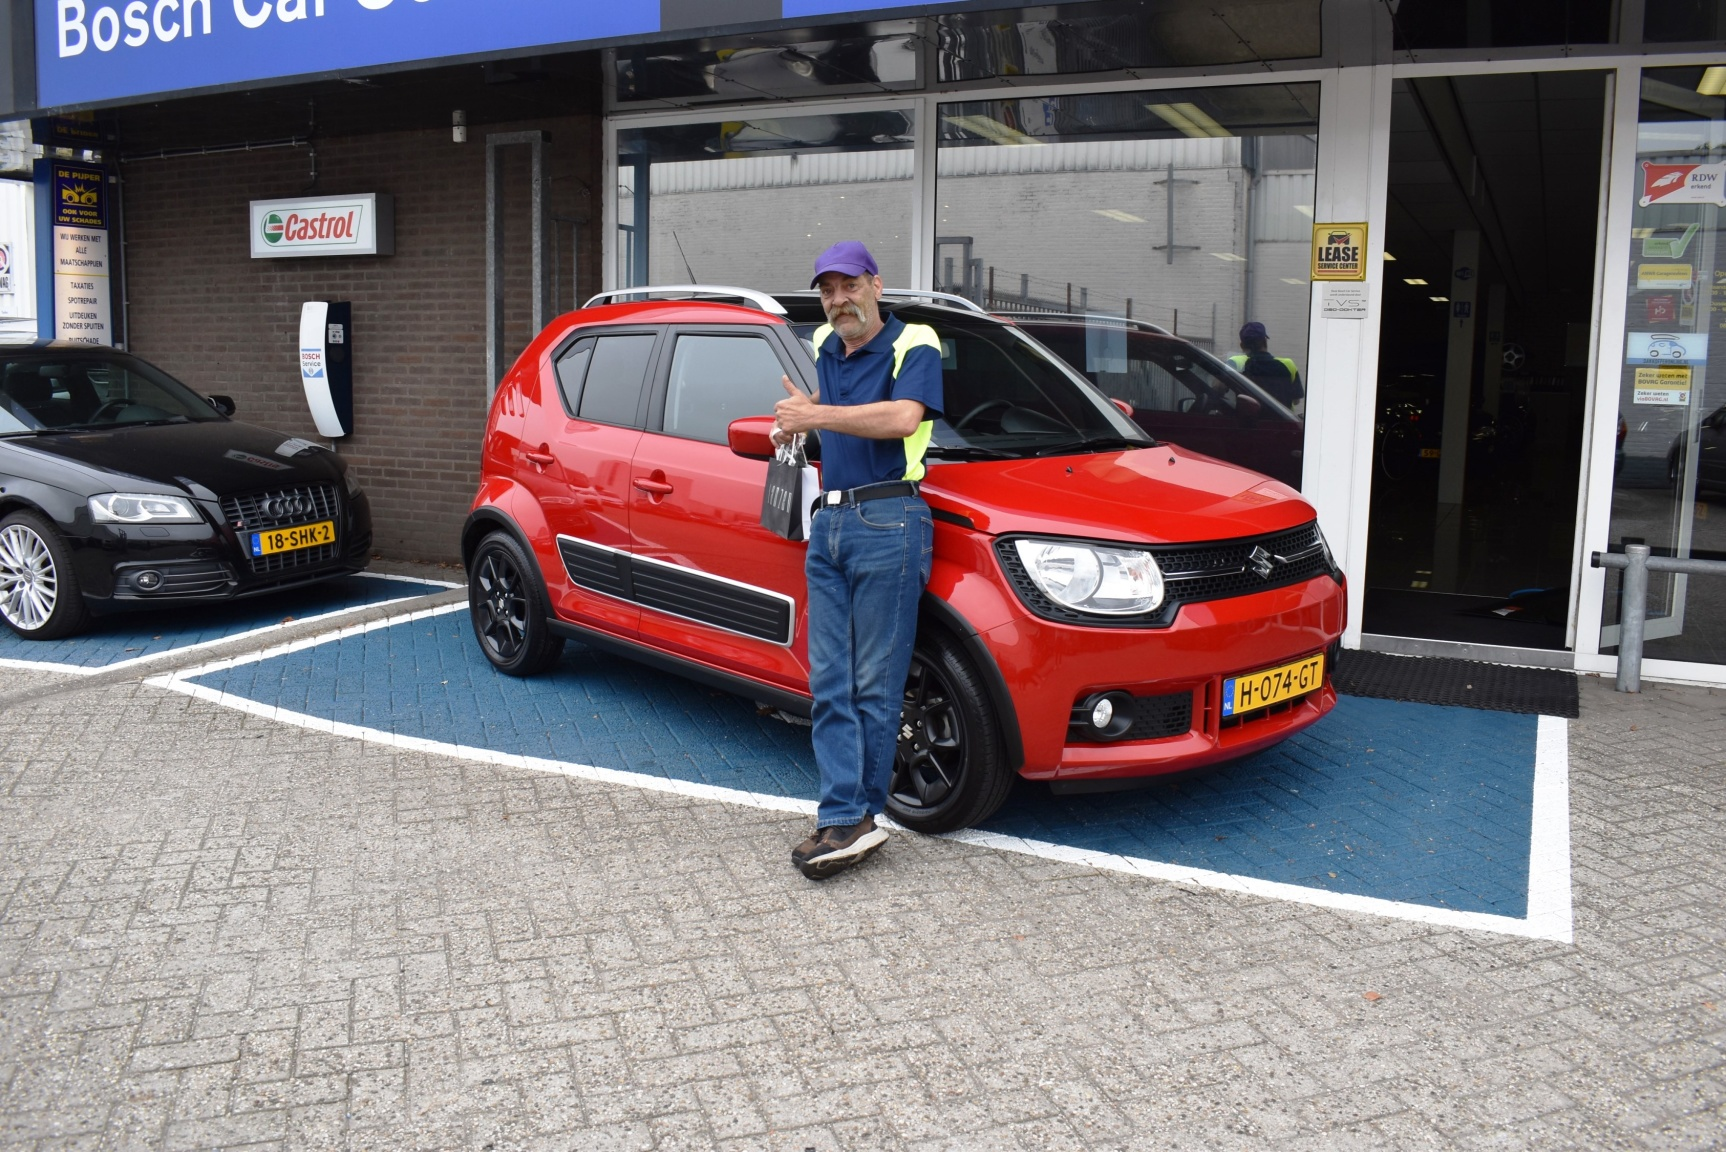 Aflevering Suzuki Ignis-2021-09-30 12:27:10